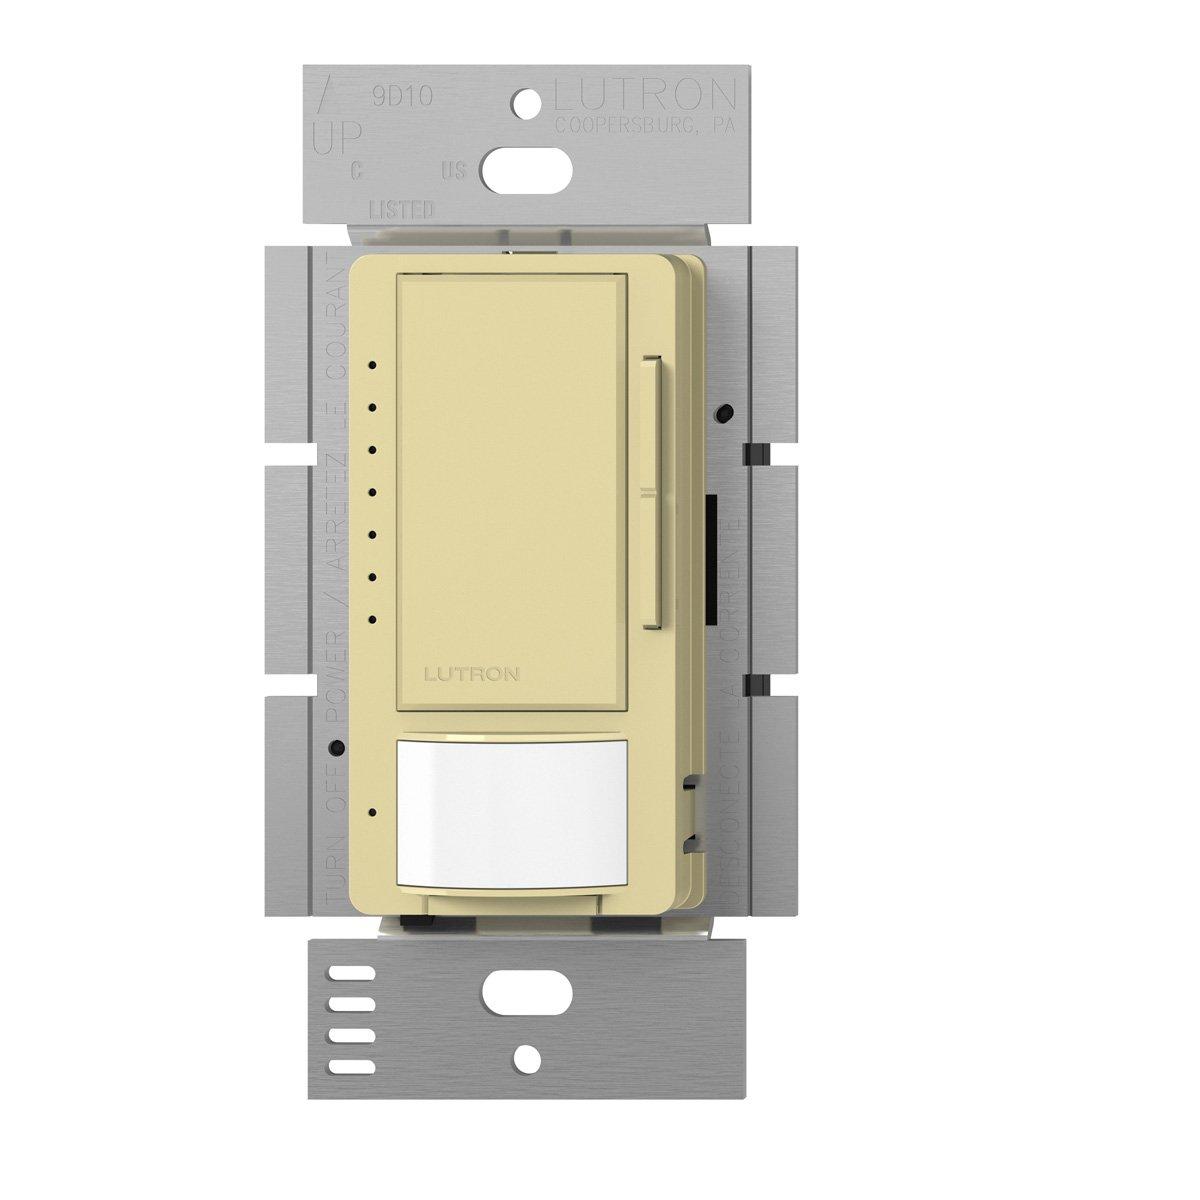 Lutron Maestro CL単極/ multi-location Vacancy Sensingディマー MSCL-VP153M-IV 1 B00FQL25F6 アイボリー アイボリー